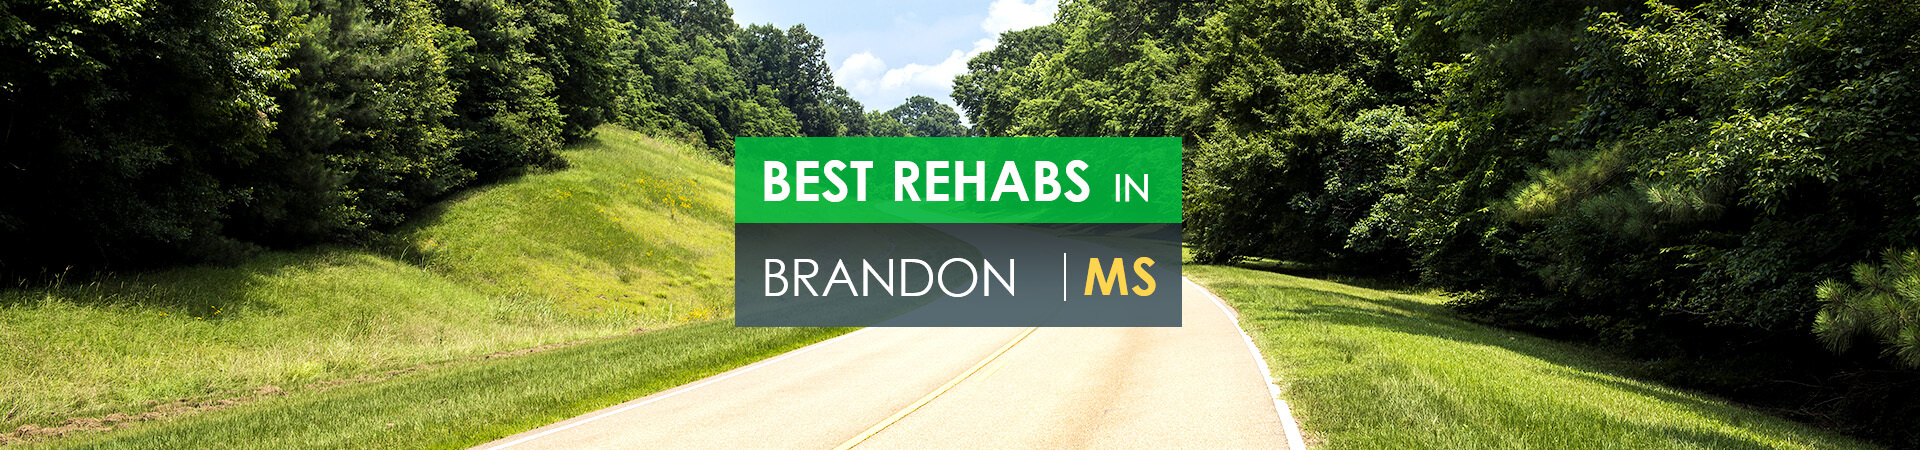 Best rehabs in Brandon, MS